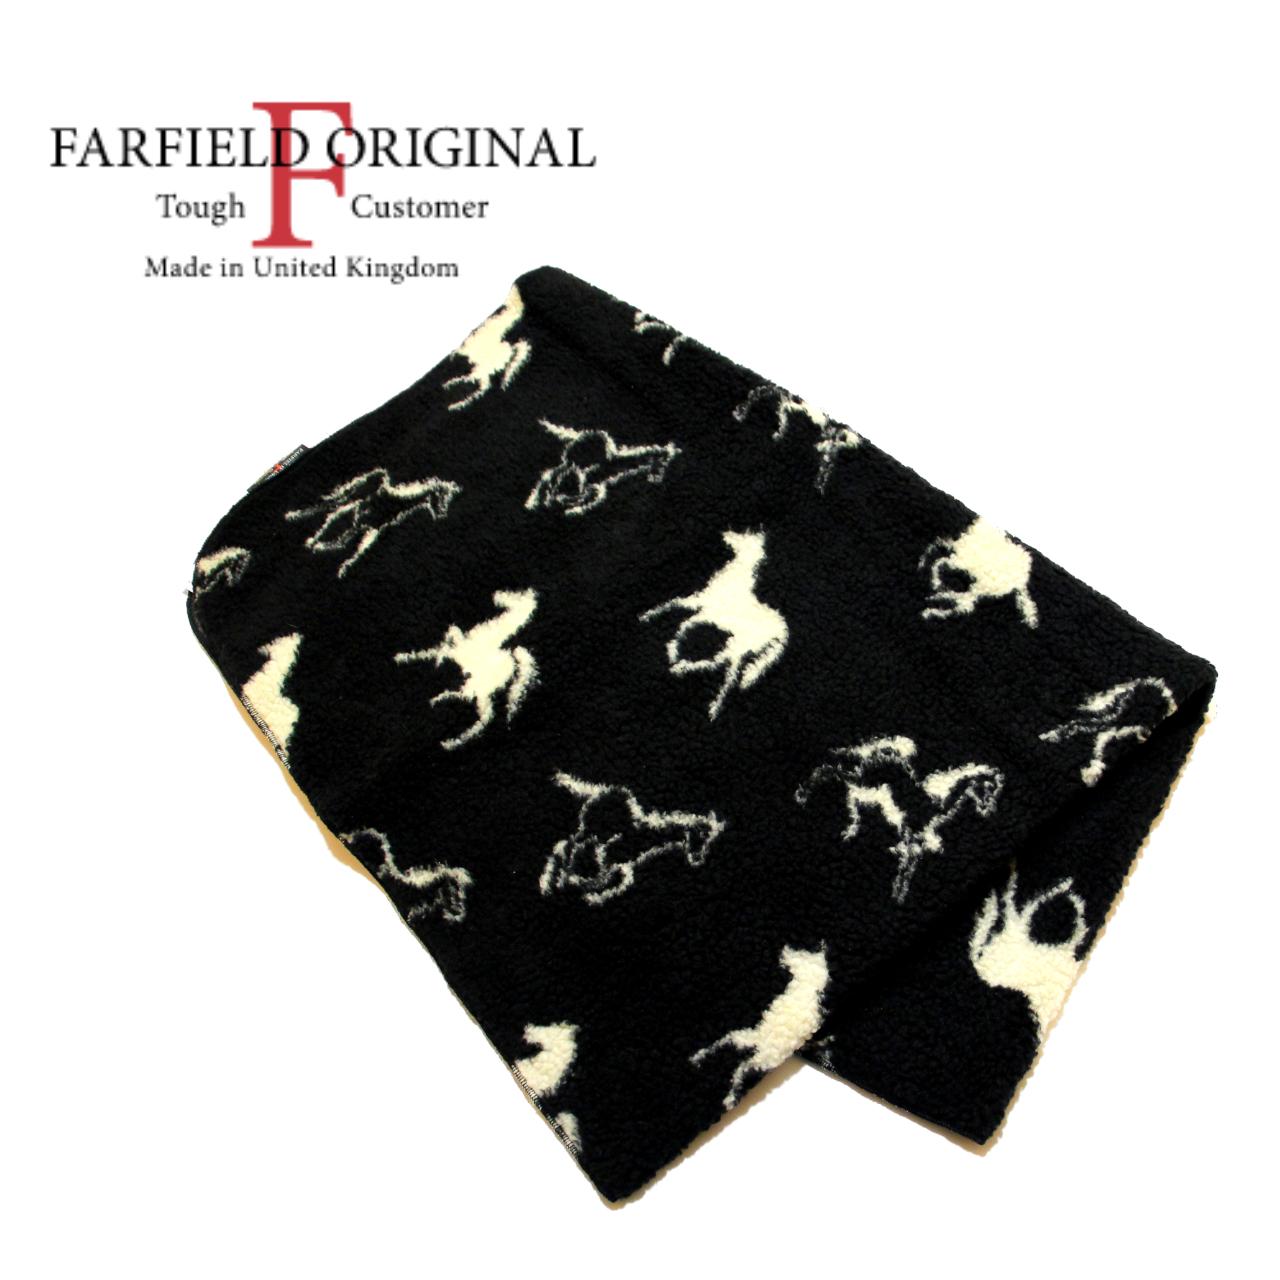 FARFIELD ORIGINAL 馬柄 フリース ブランケット 〈Black〉